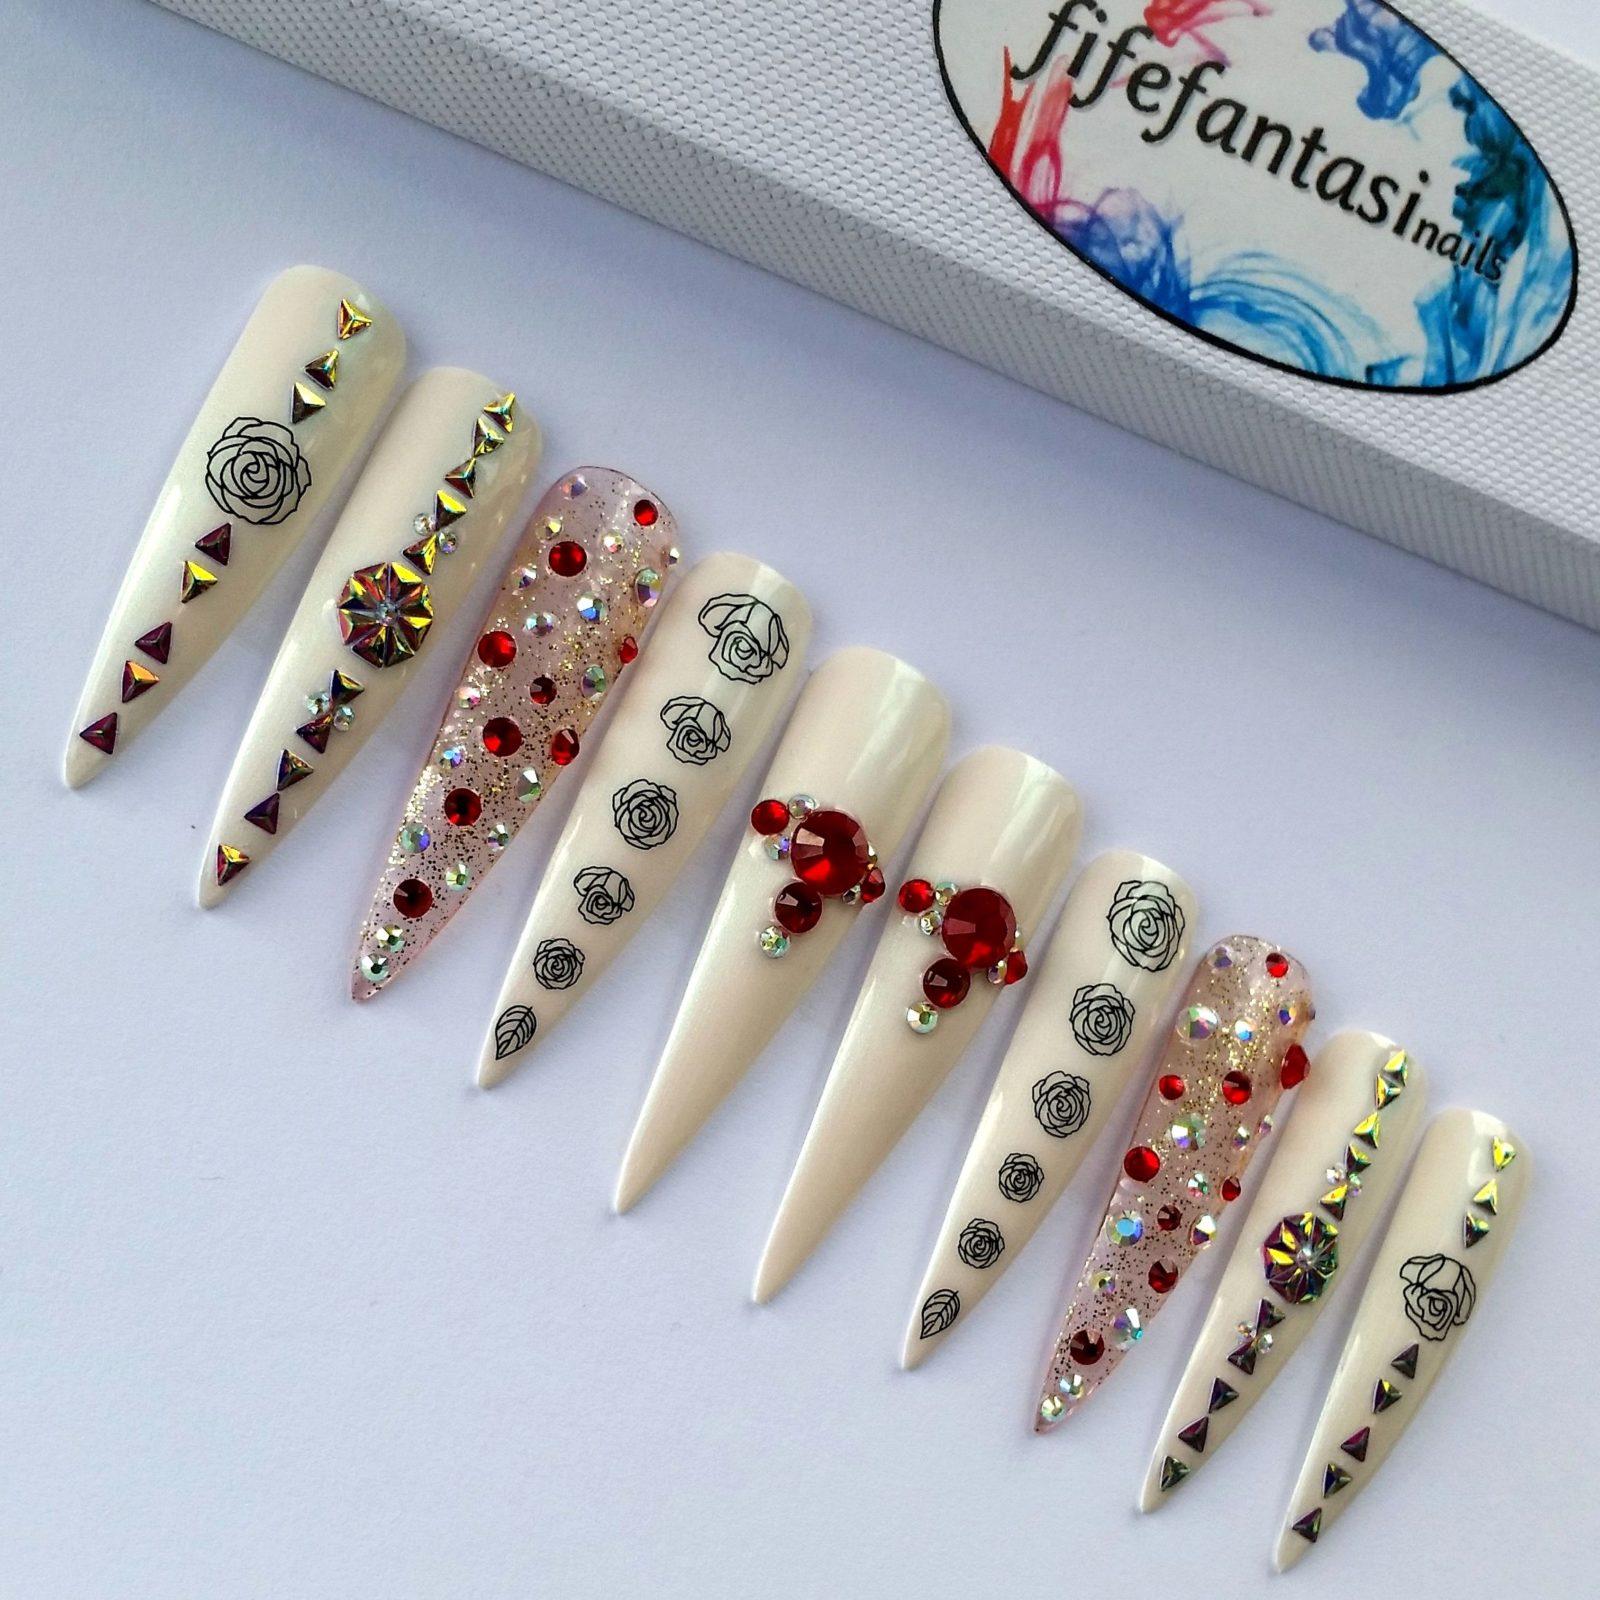 Extra Long Stiletto Nails with Swarovski crystals – Fife Fantasi Nails